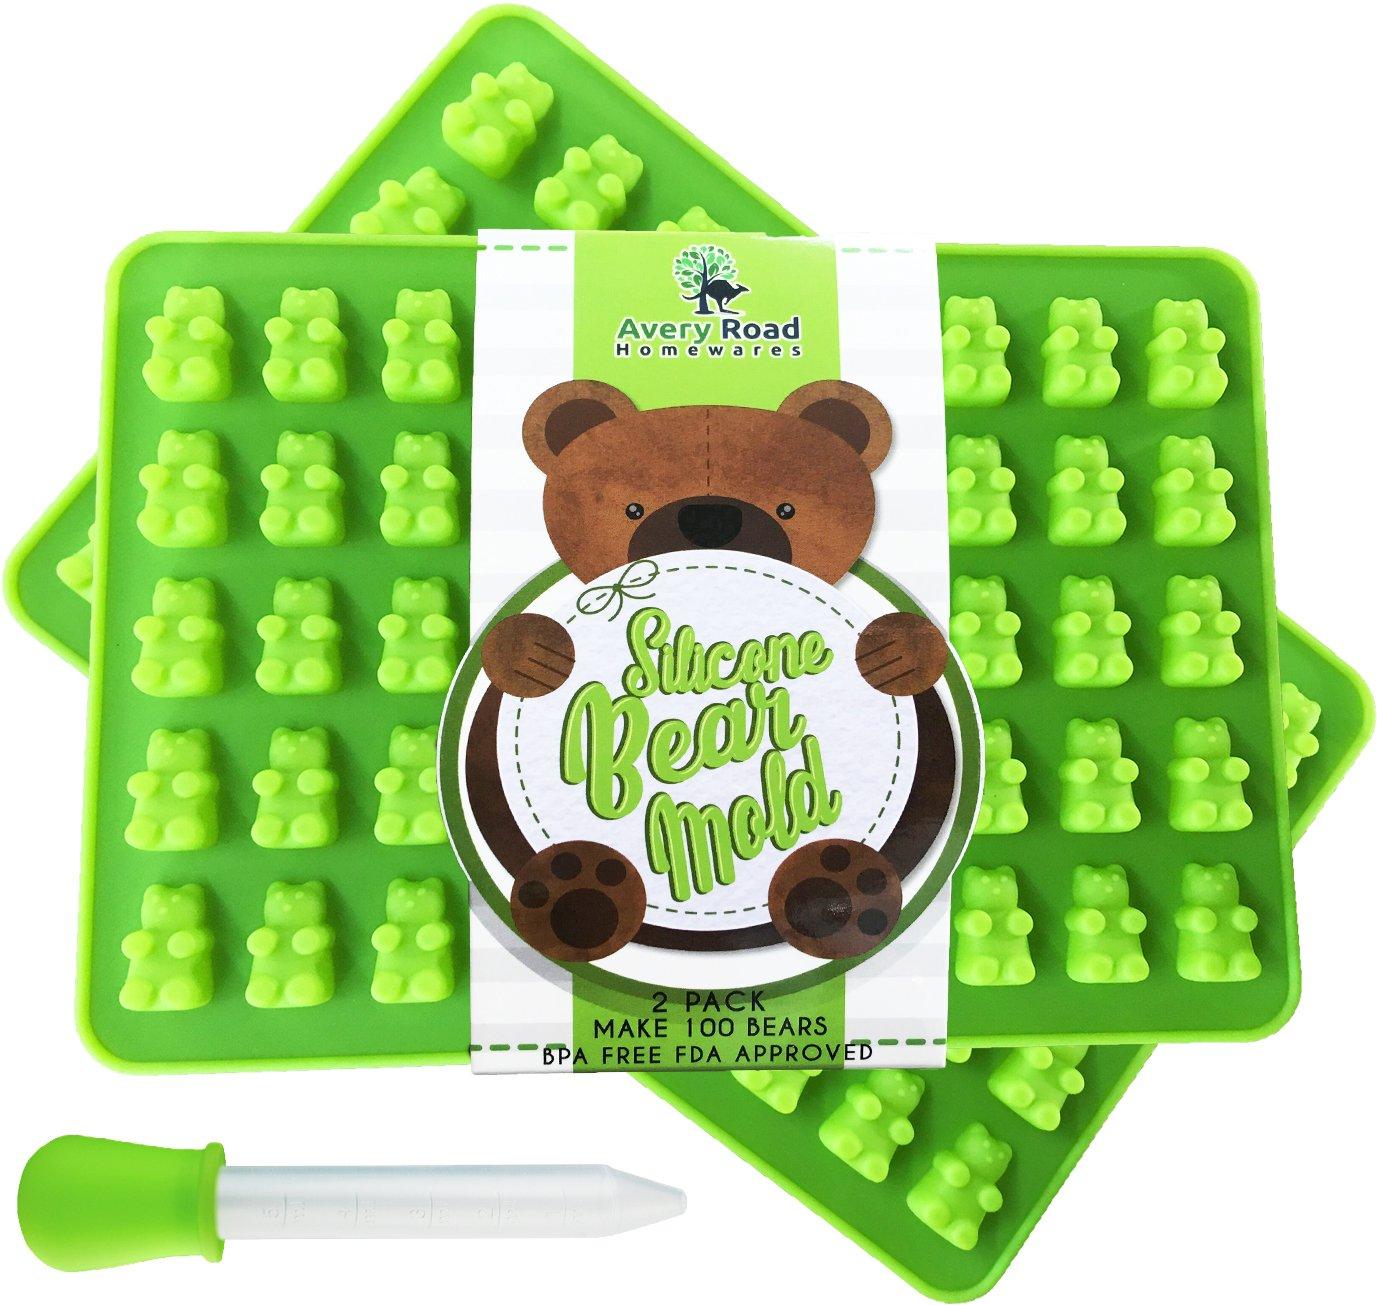 Premium Gummy Bear Mold - 2 PACK - BONUS DROPPER - 100 Bears on Trays + RECIPE PDF - Silicone Molds 100% Food Grade BPA Free FDA Approved Candy Chocolate & Gelatin Maker